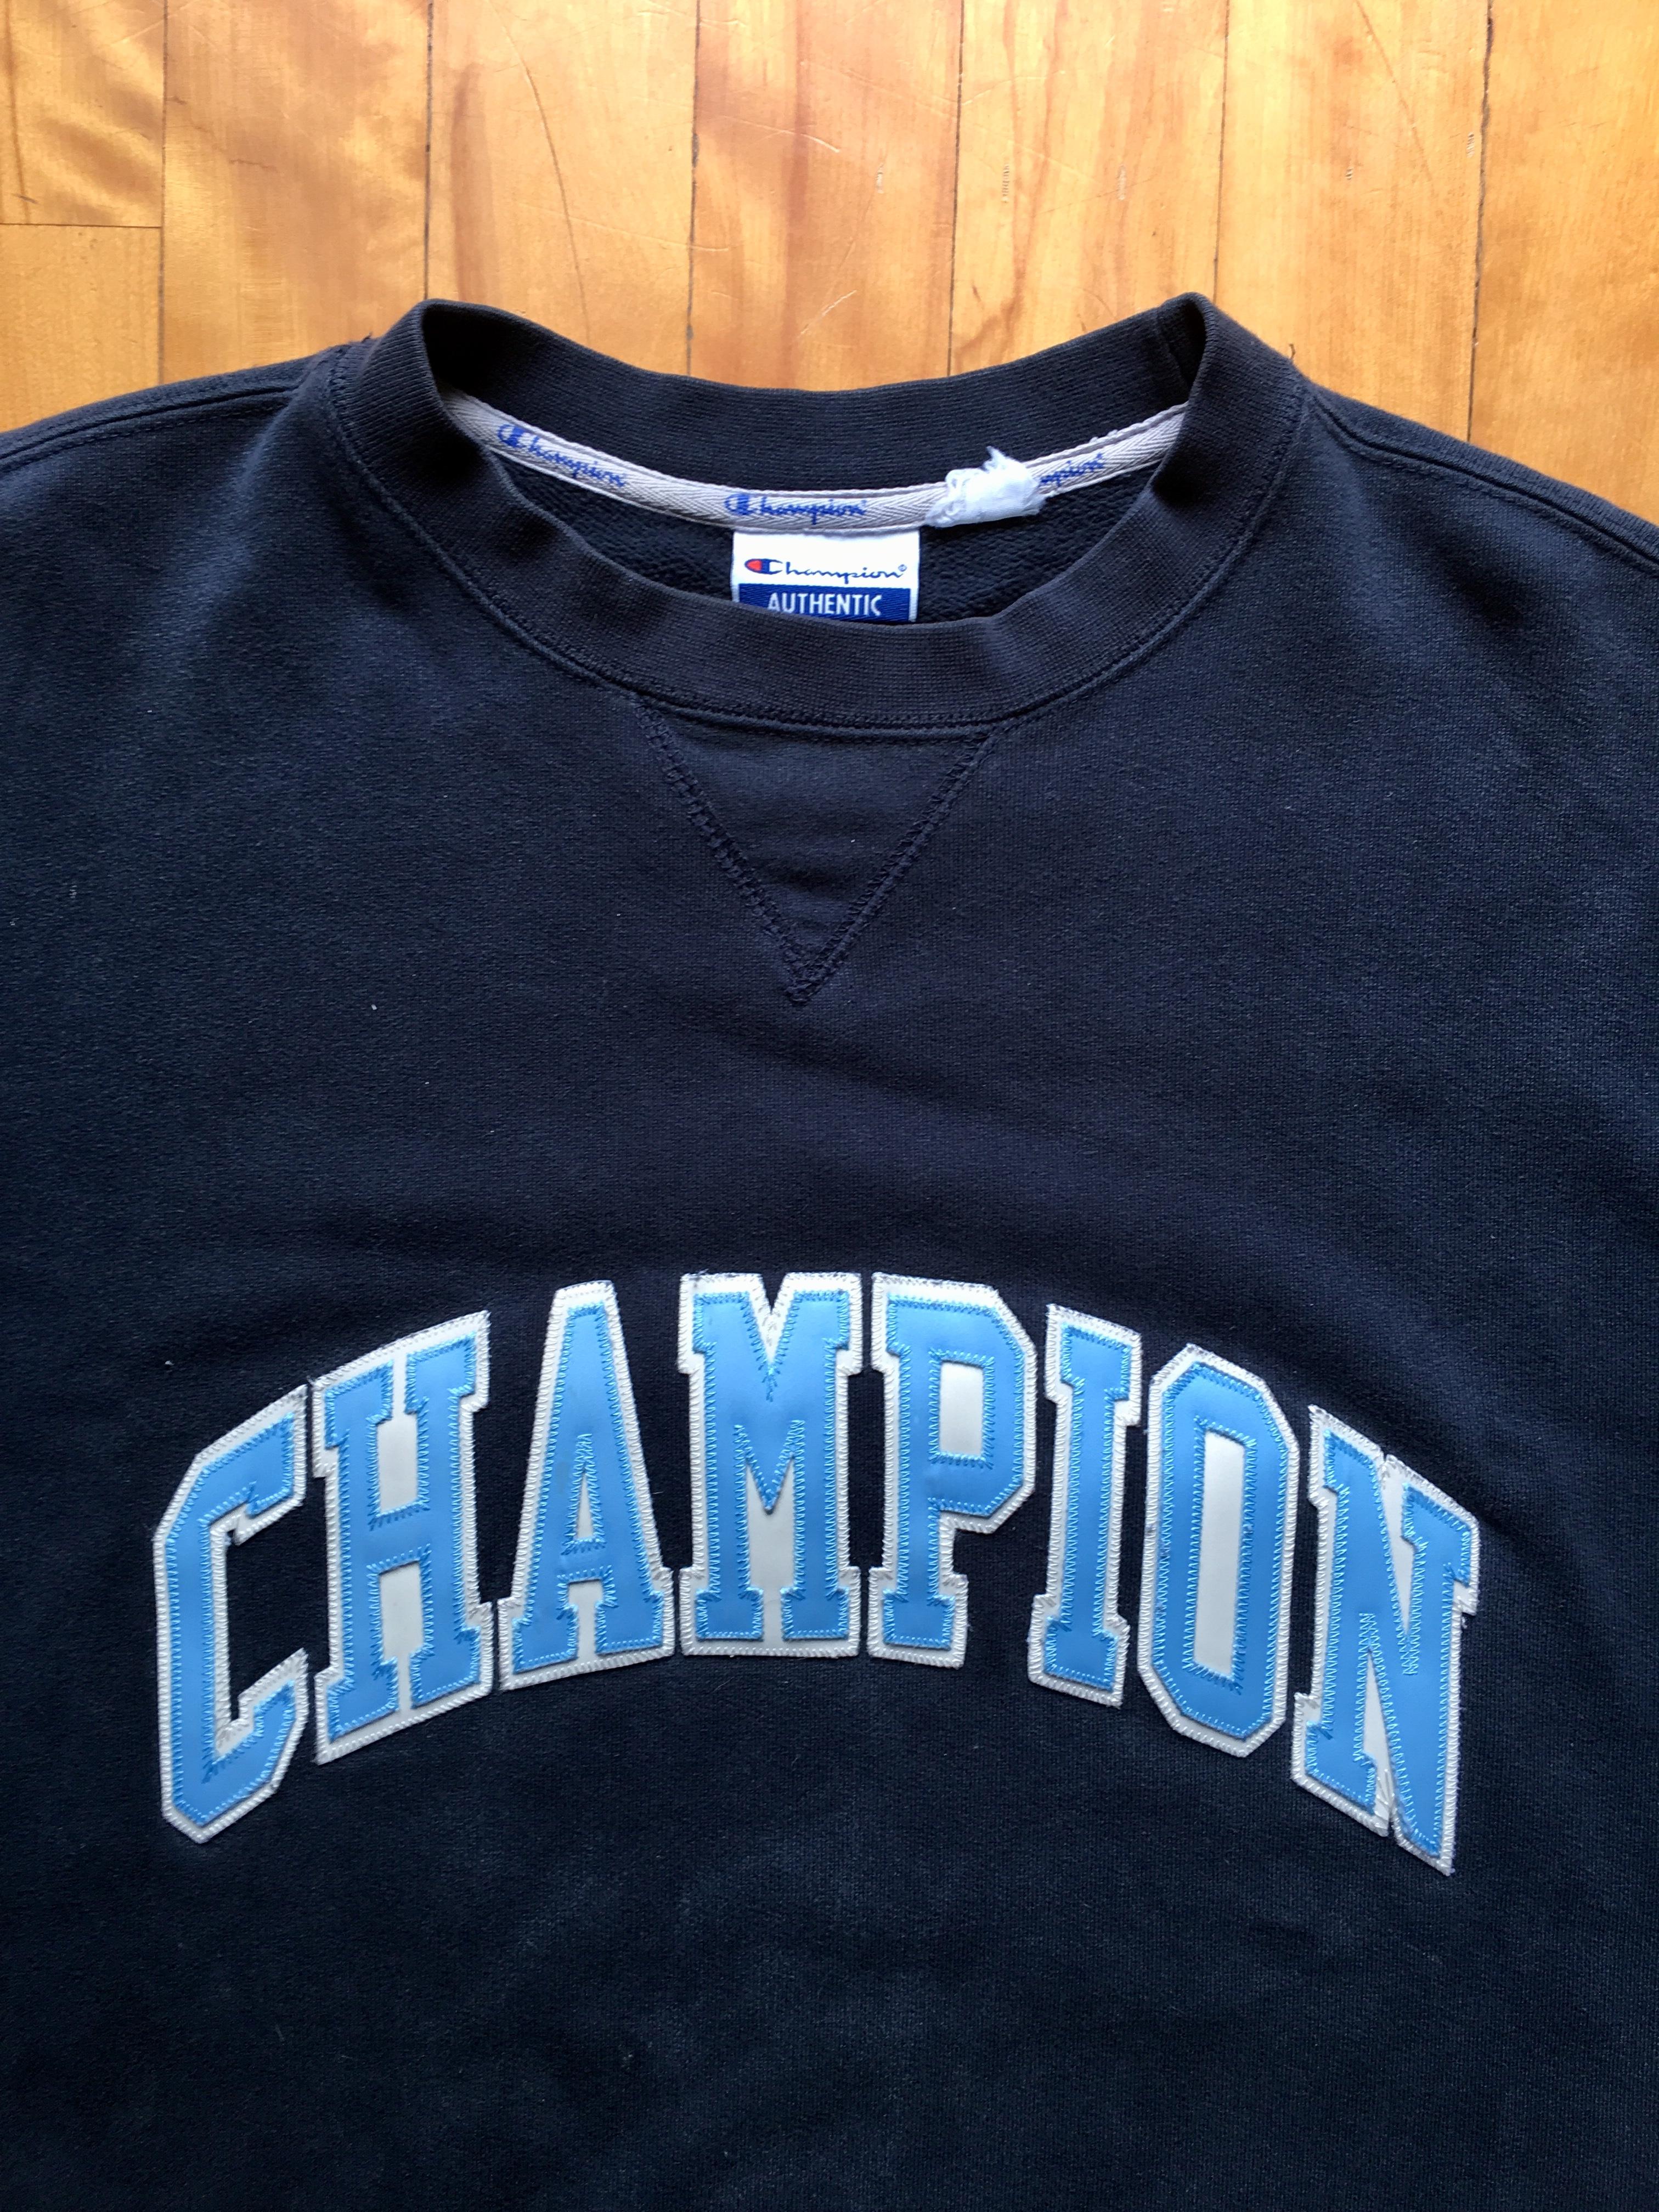 Vintage Champion Varsity Block letters Crewneck Classic 90s sweatshirt